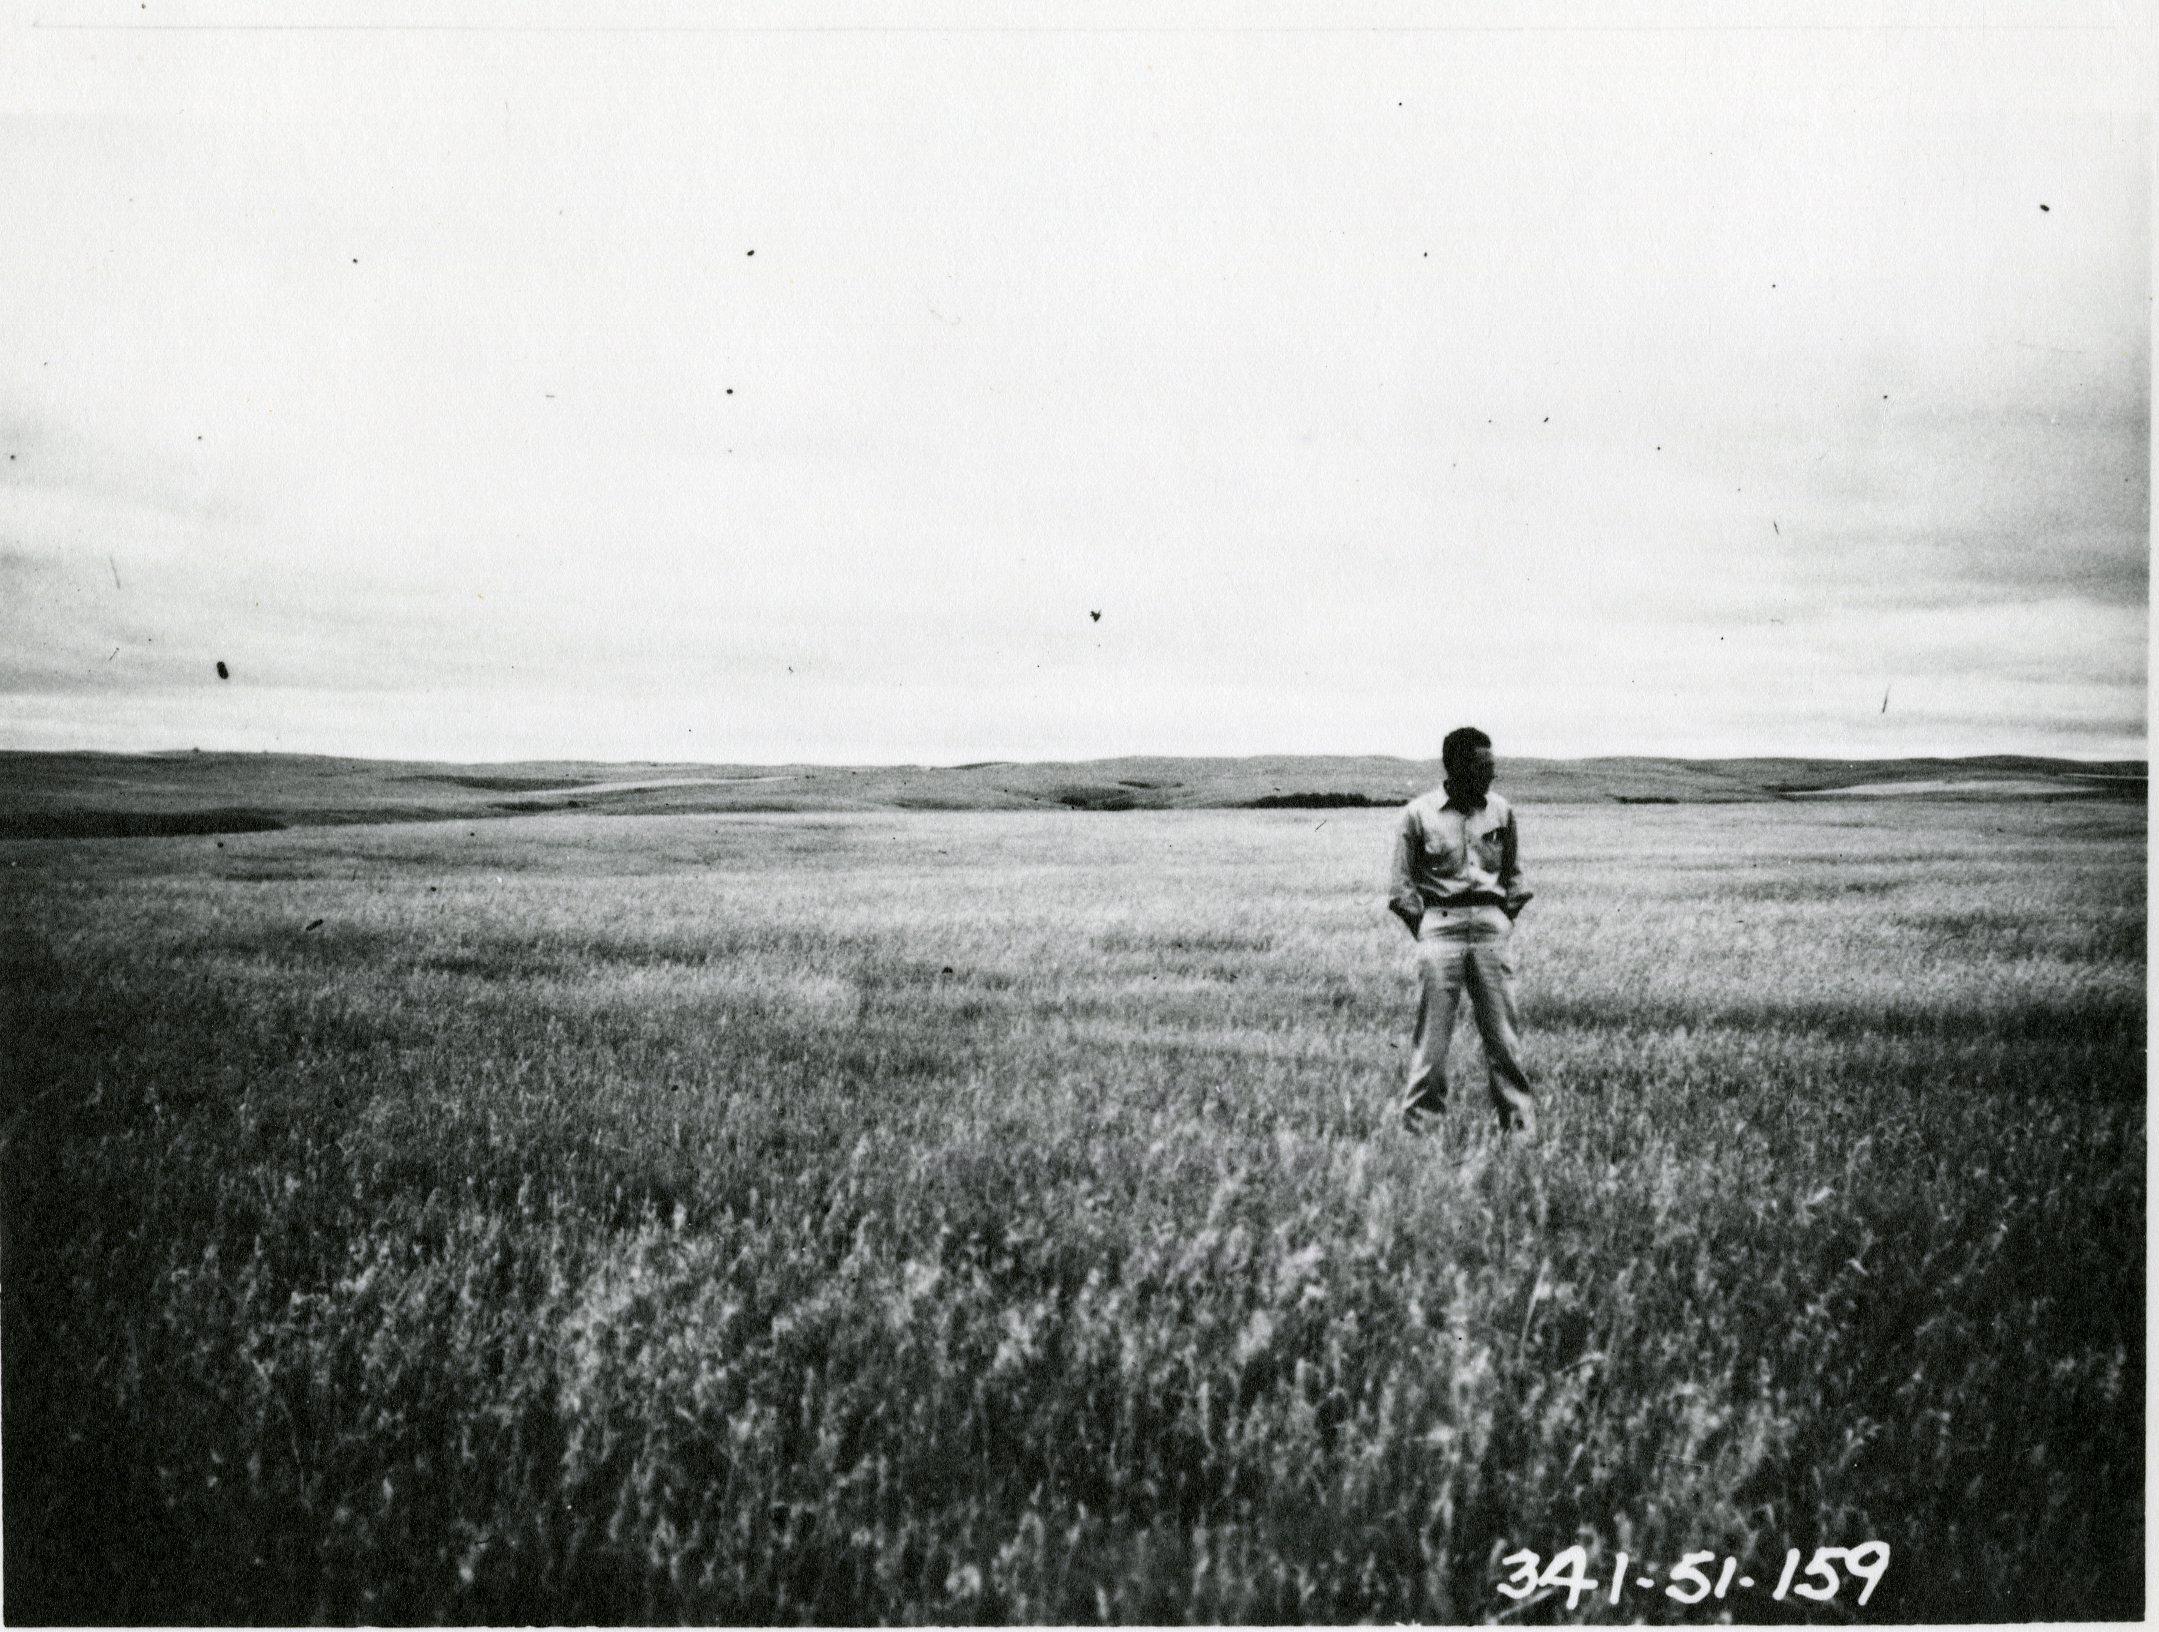 George Gillette's Wheat Field